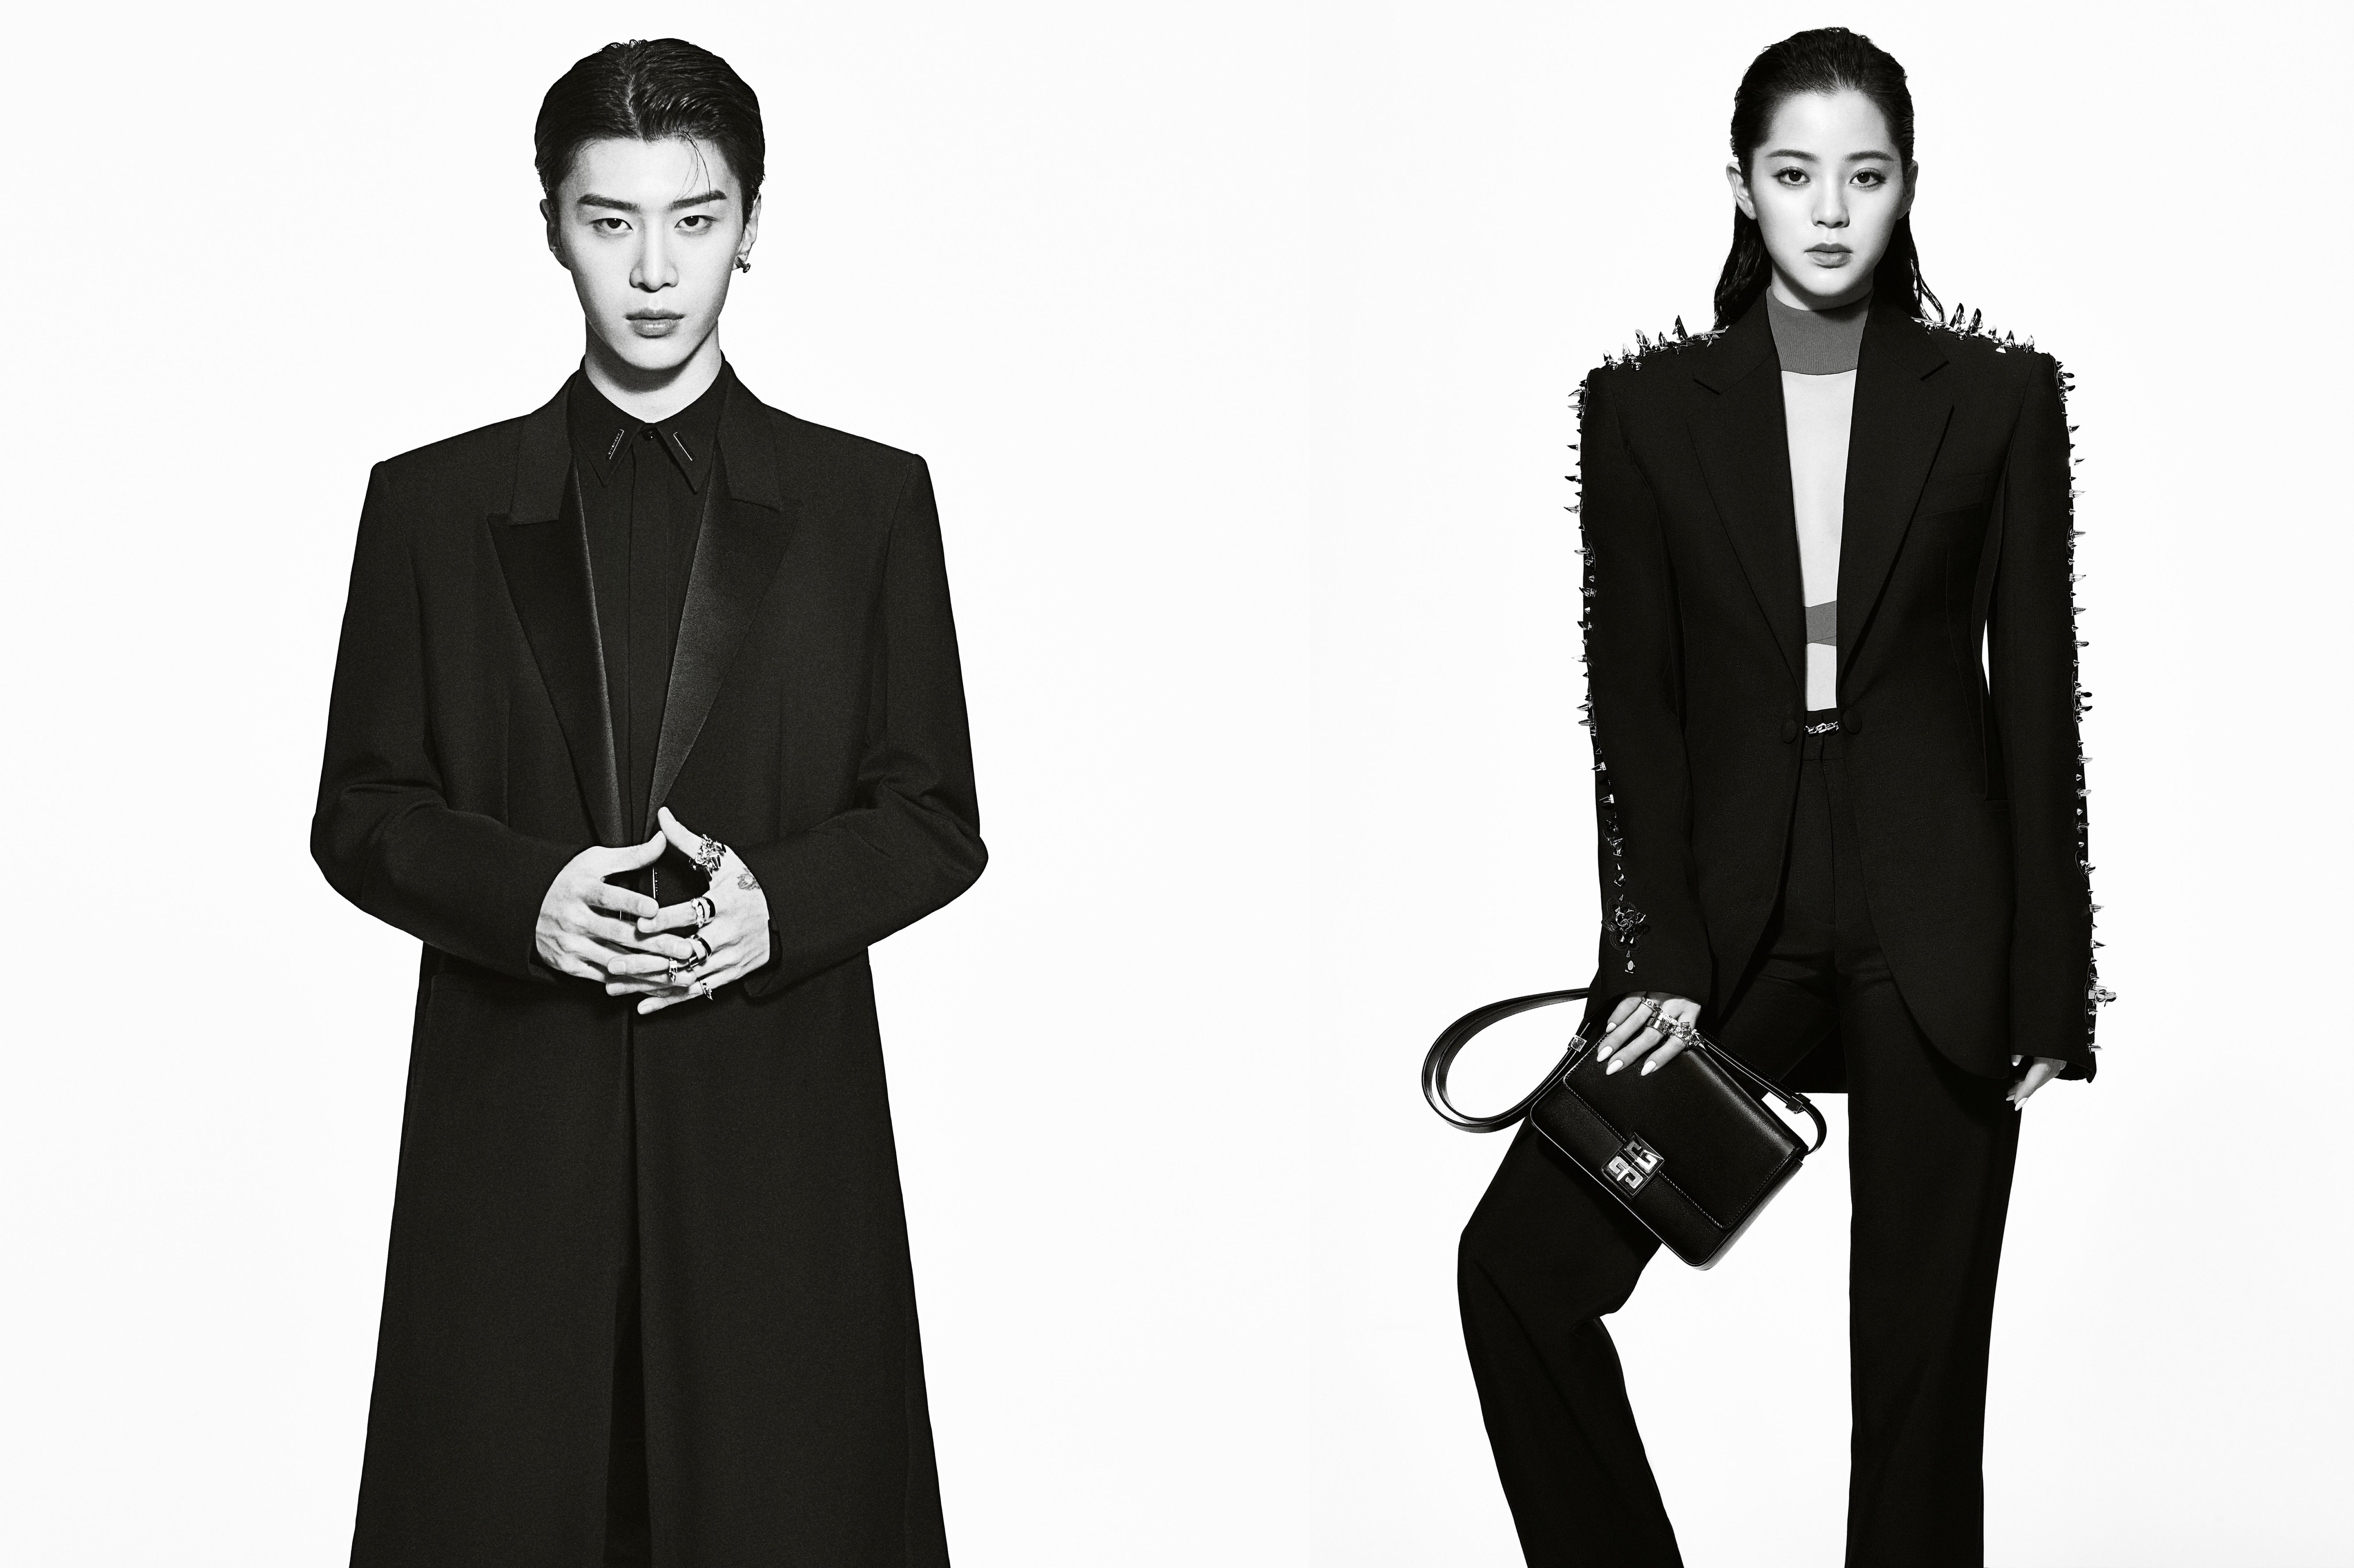 Fan Chengcheng, Nana Ou-Yang are Givenchy's Brand Ambassadors in China